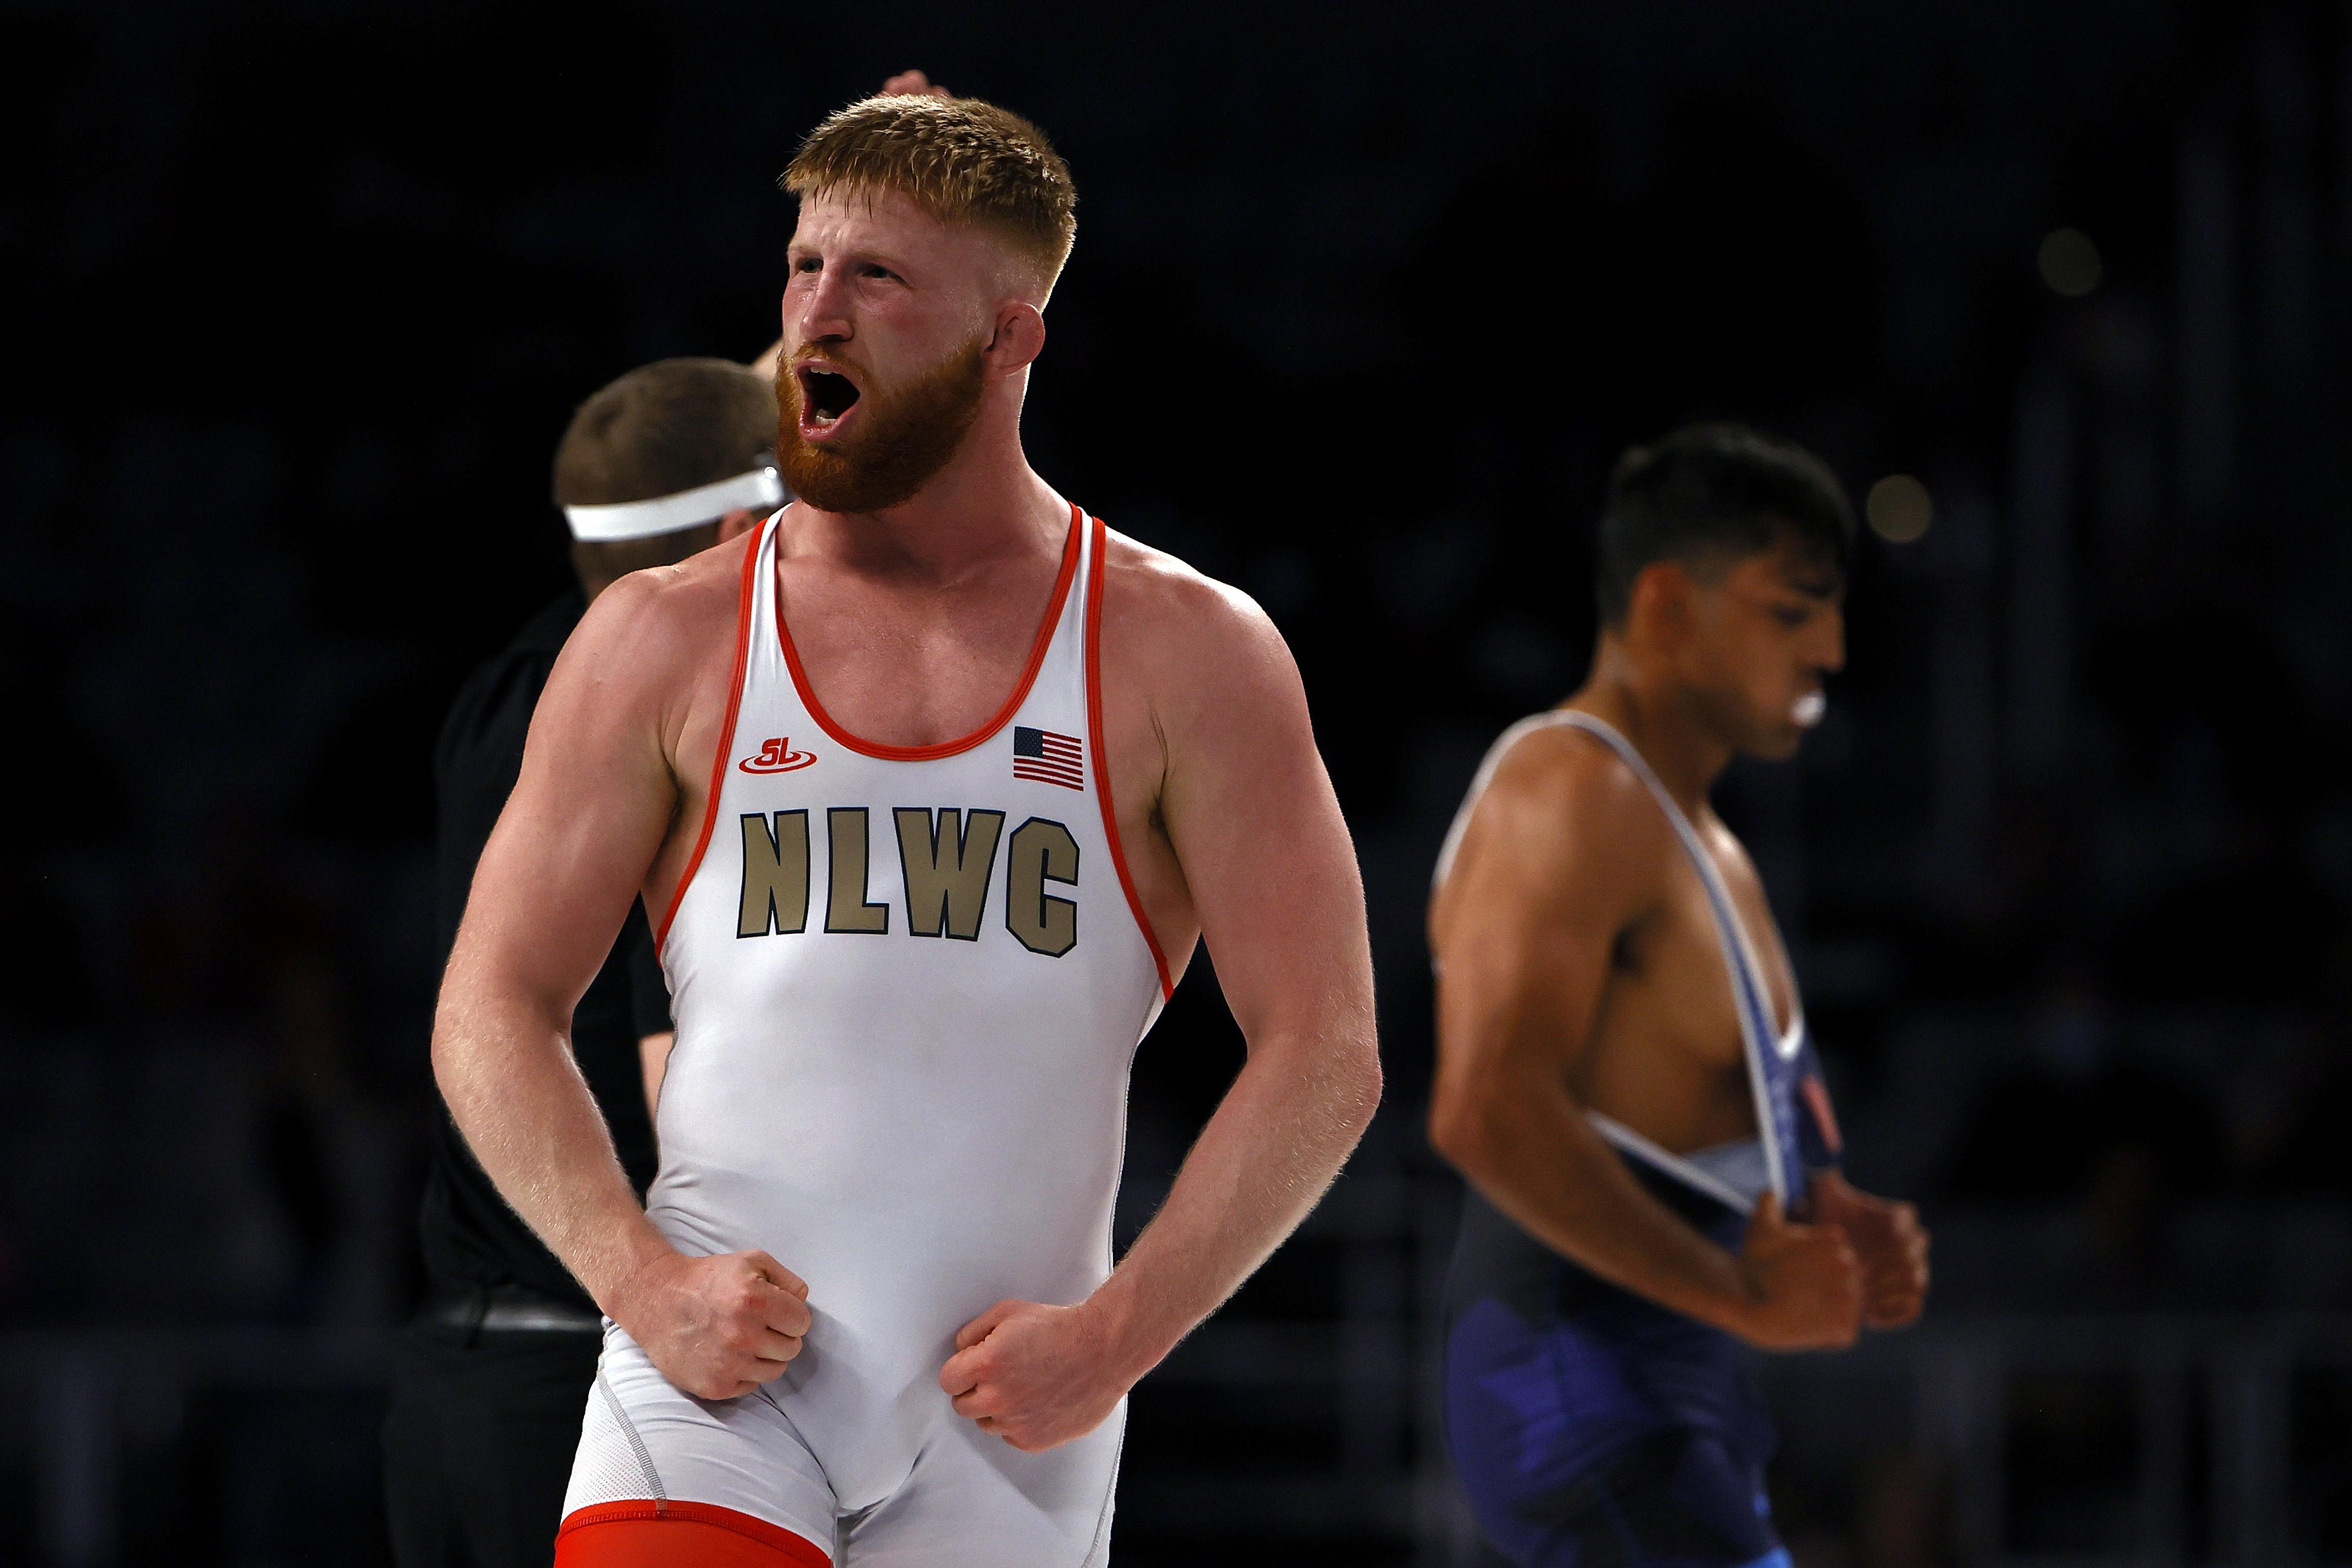 U.S. Olympic wrestling Team Trials - Wrestling Bo Nickal mma news